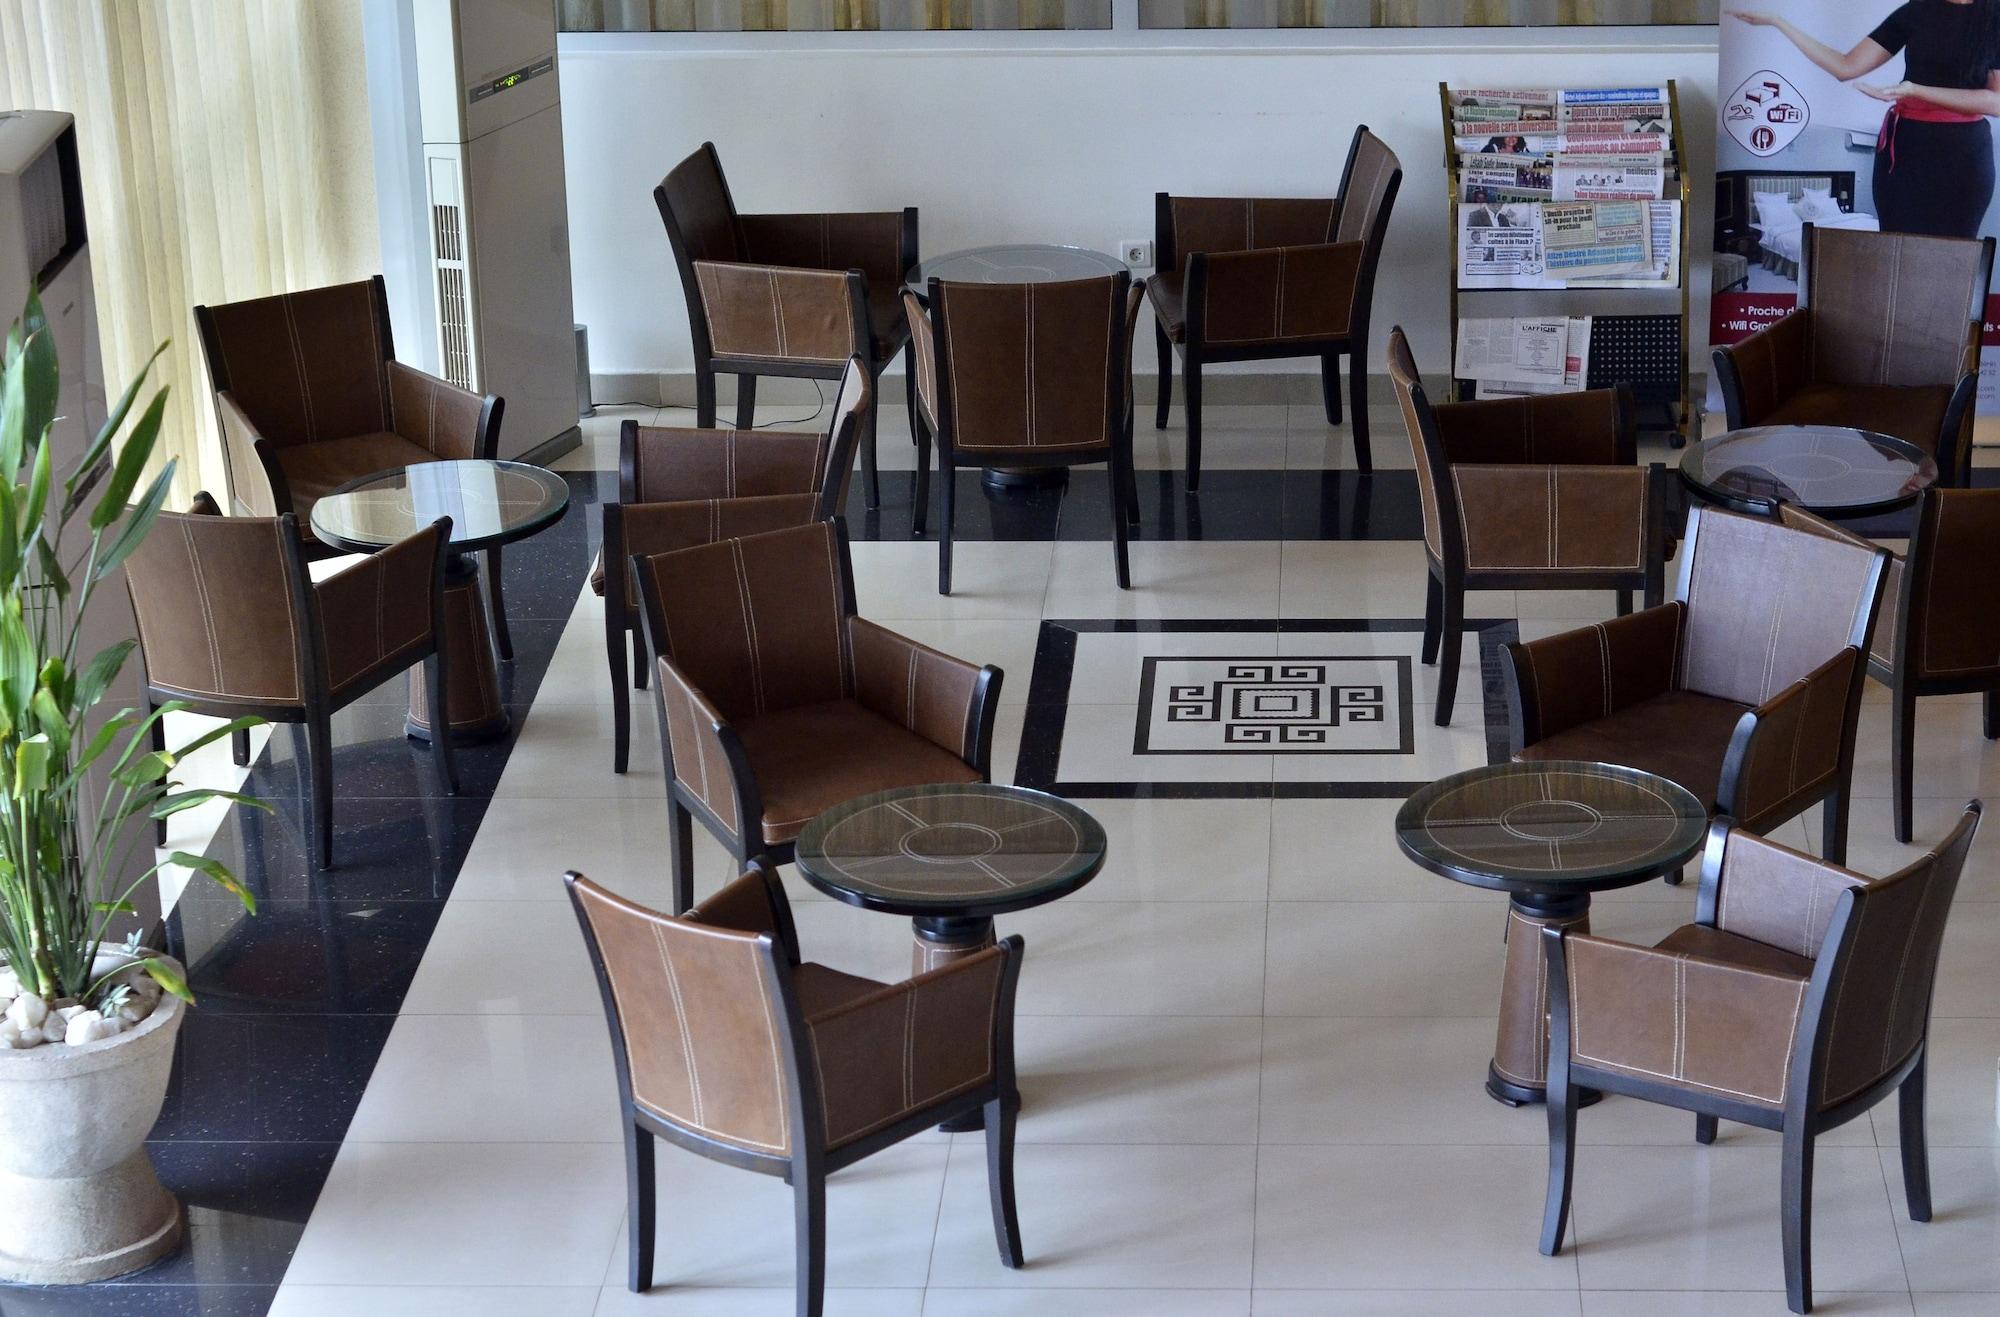 Nobila Airport Hotel, Cotonou